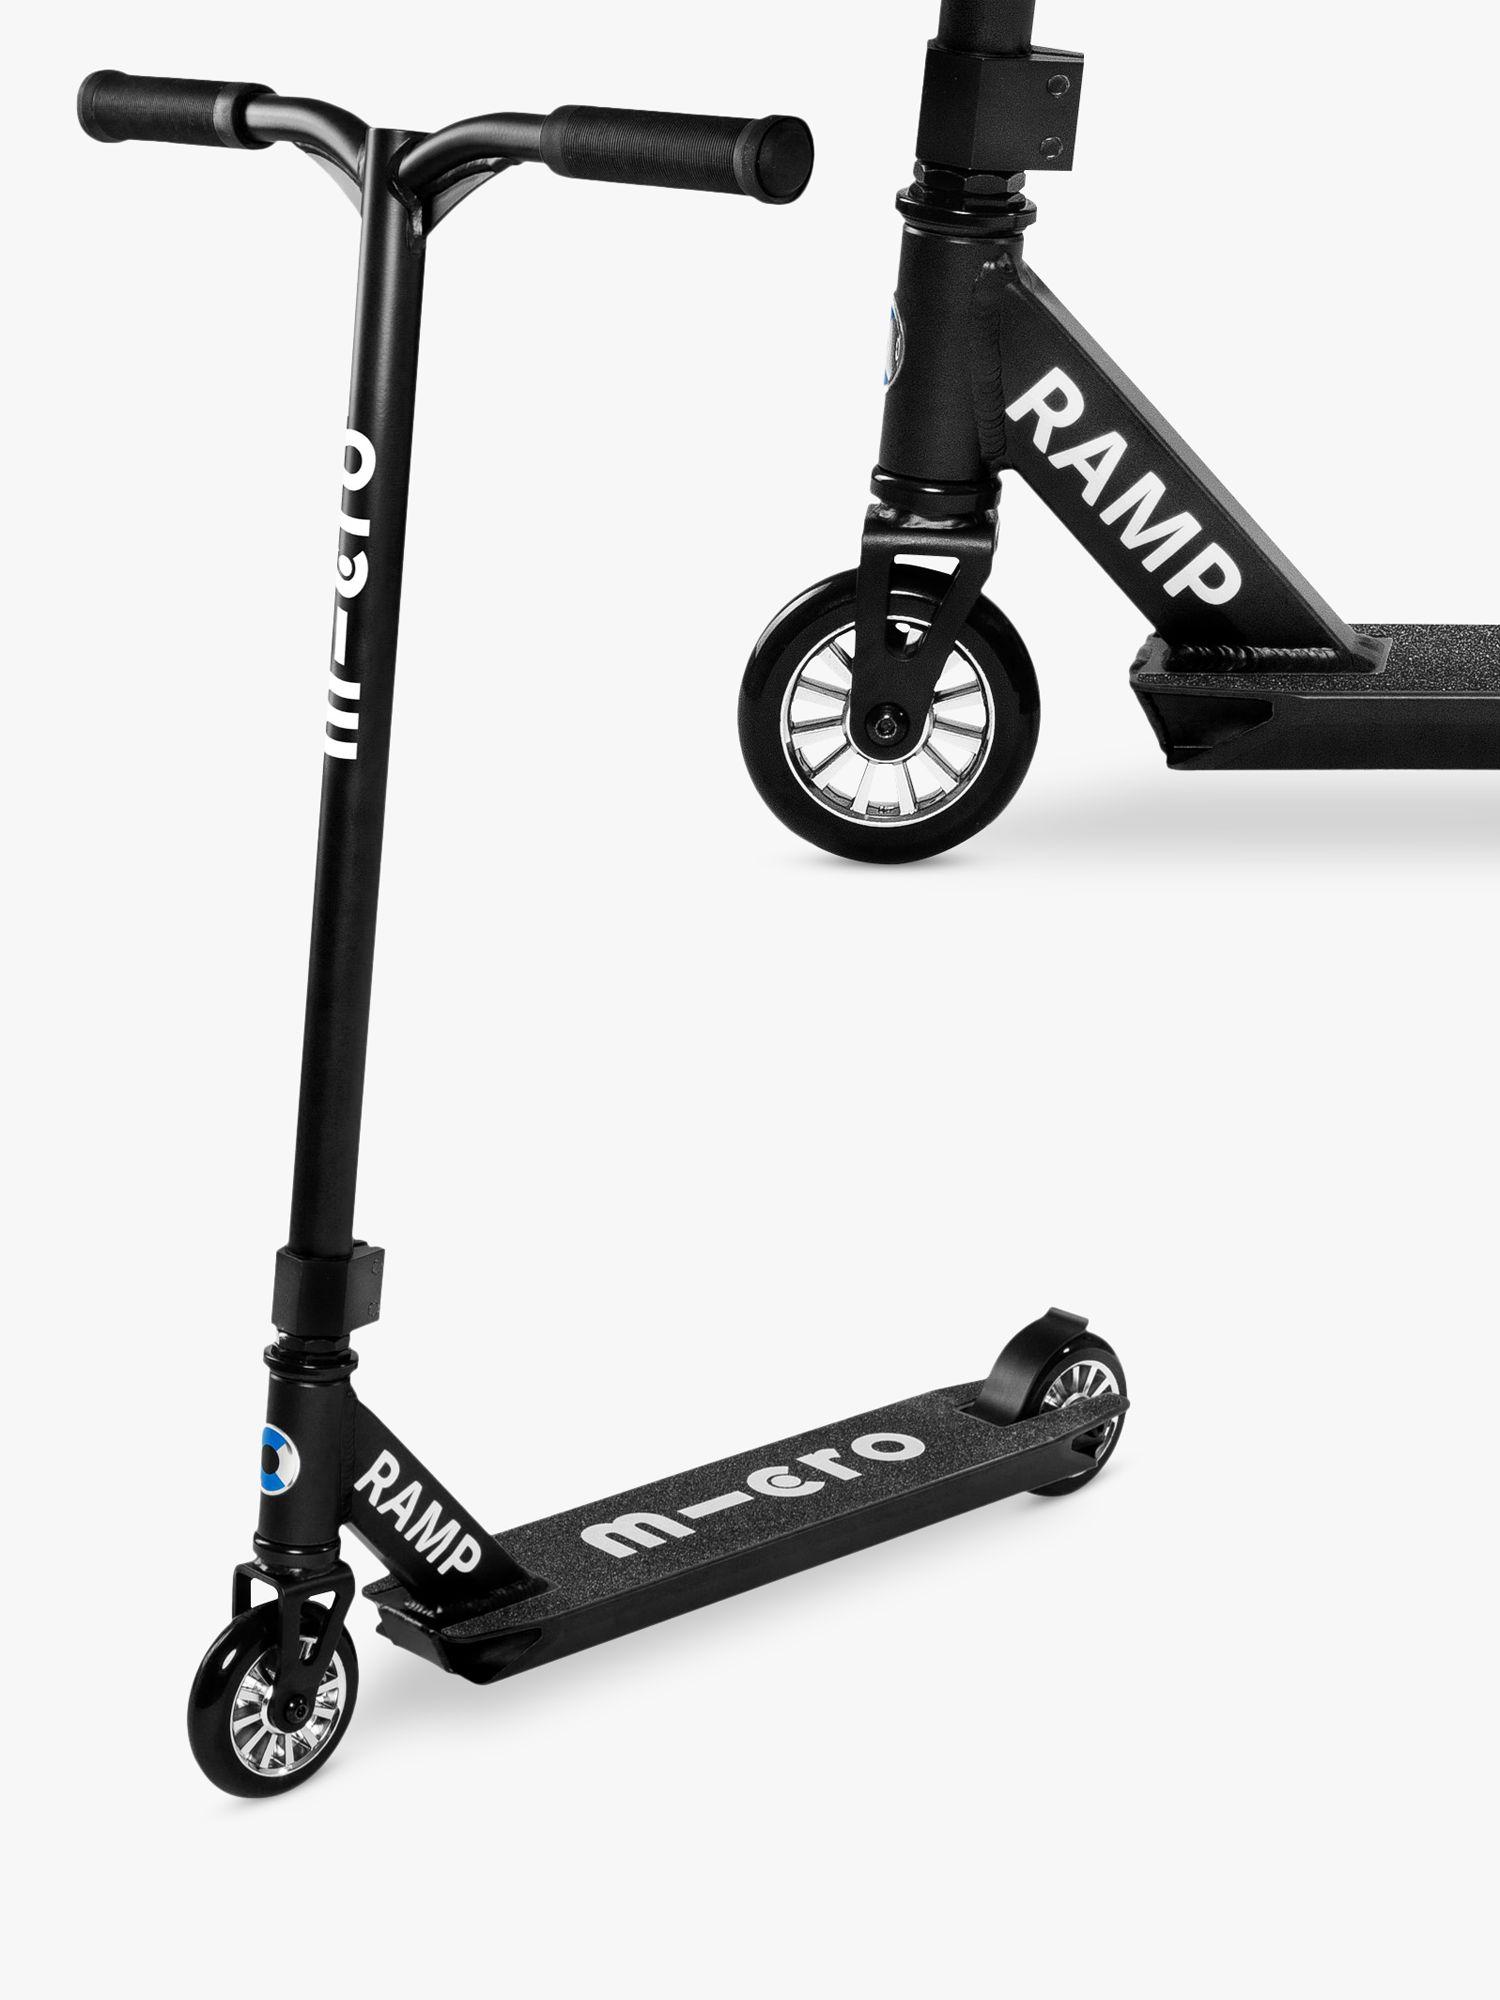 Micro Ramp Beginner Stunt Scooter 5 12 Years At John Lewis Partners